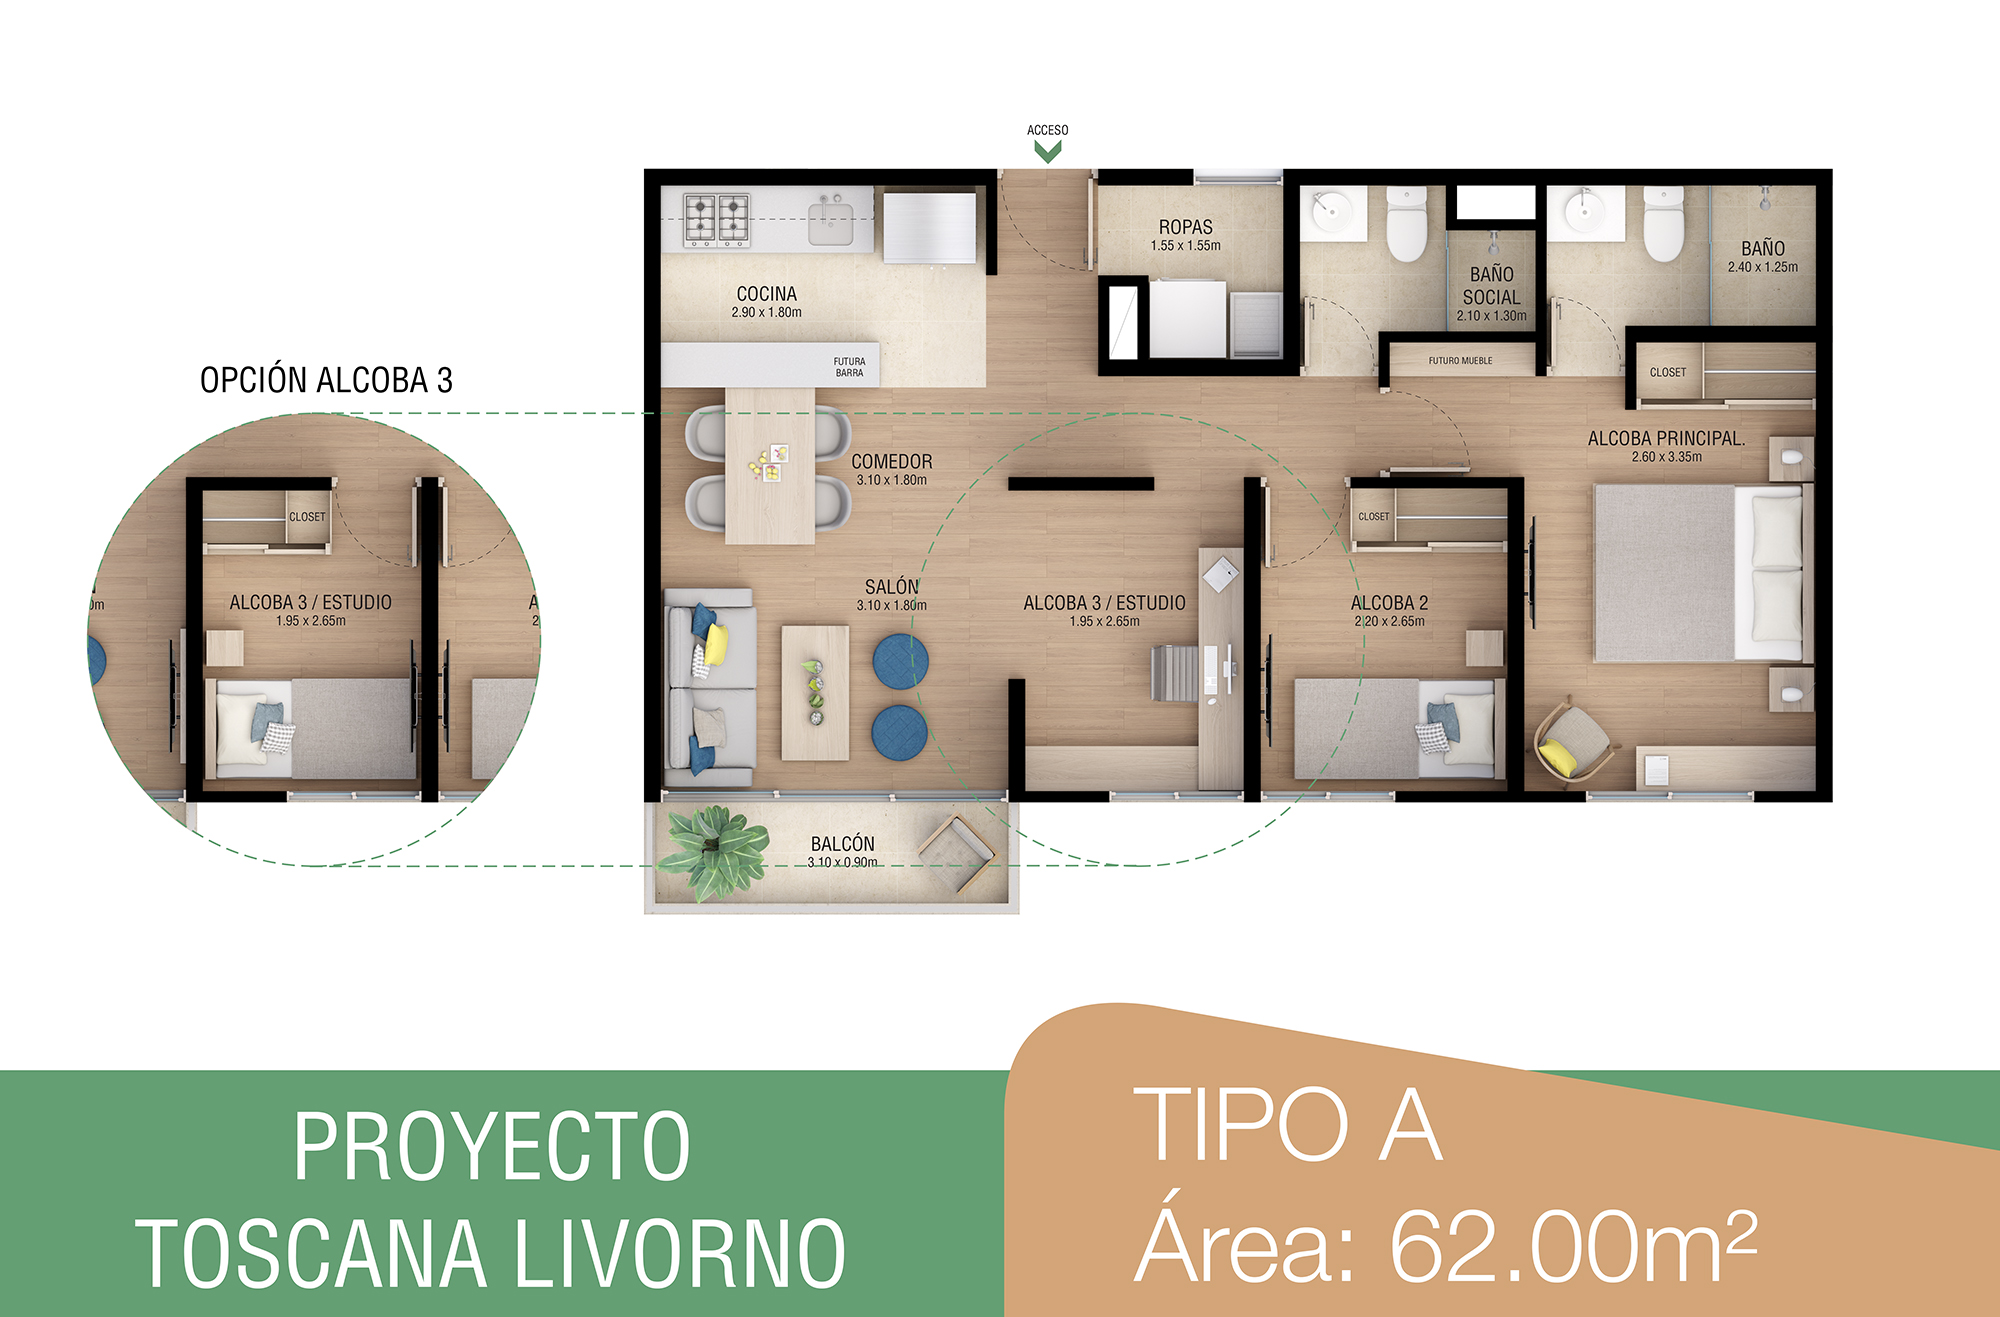 toscana-livorno-apartamentos-sabaneta-tipoa